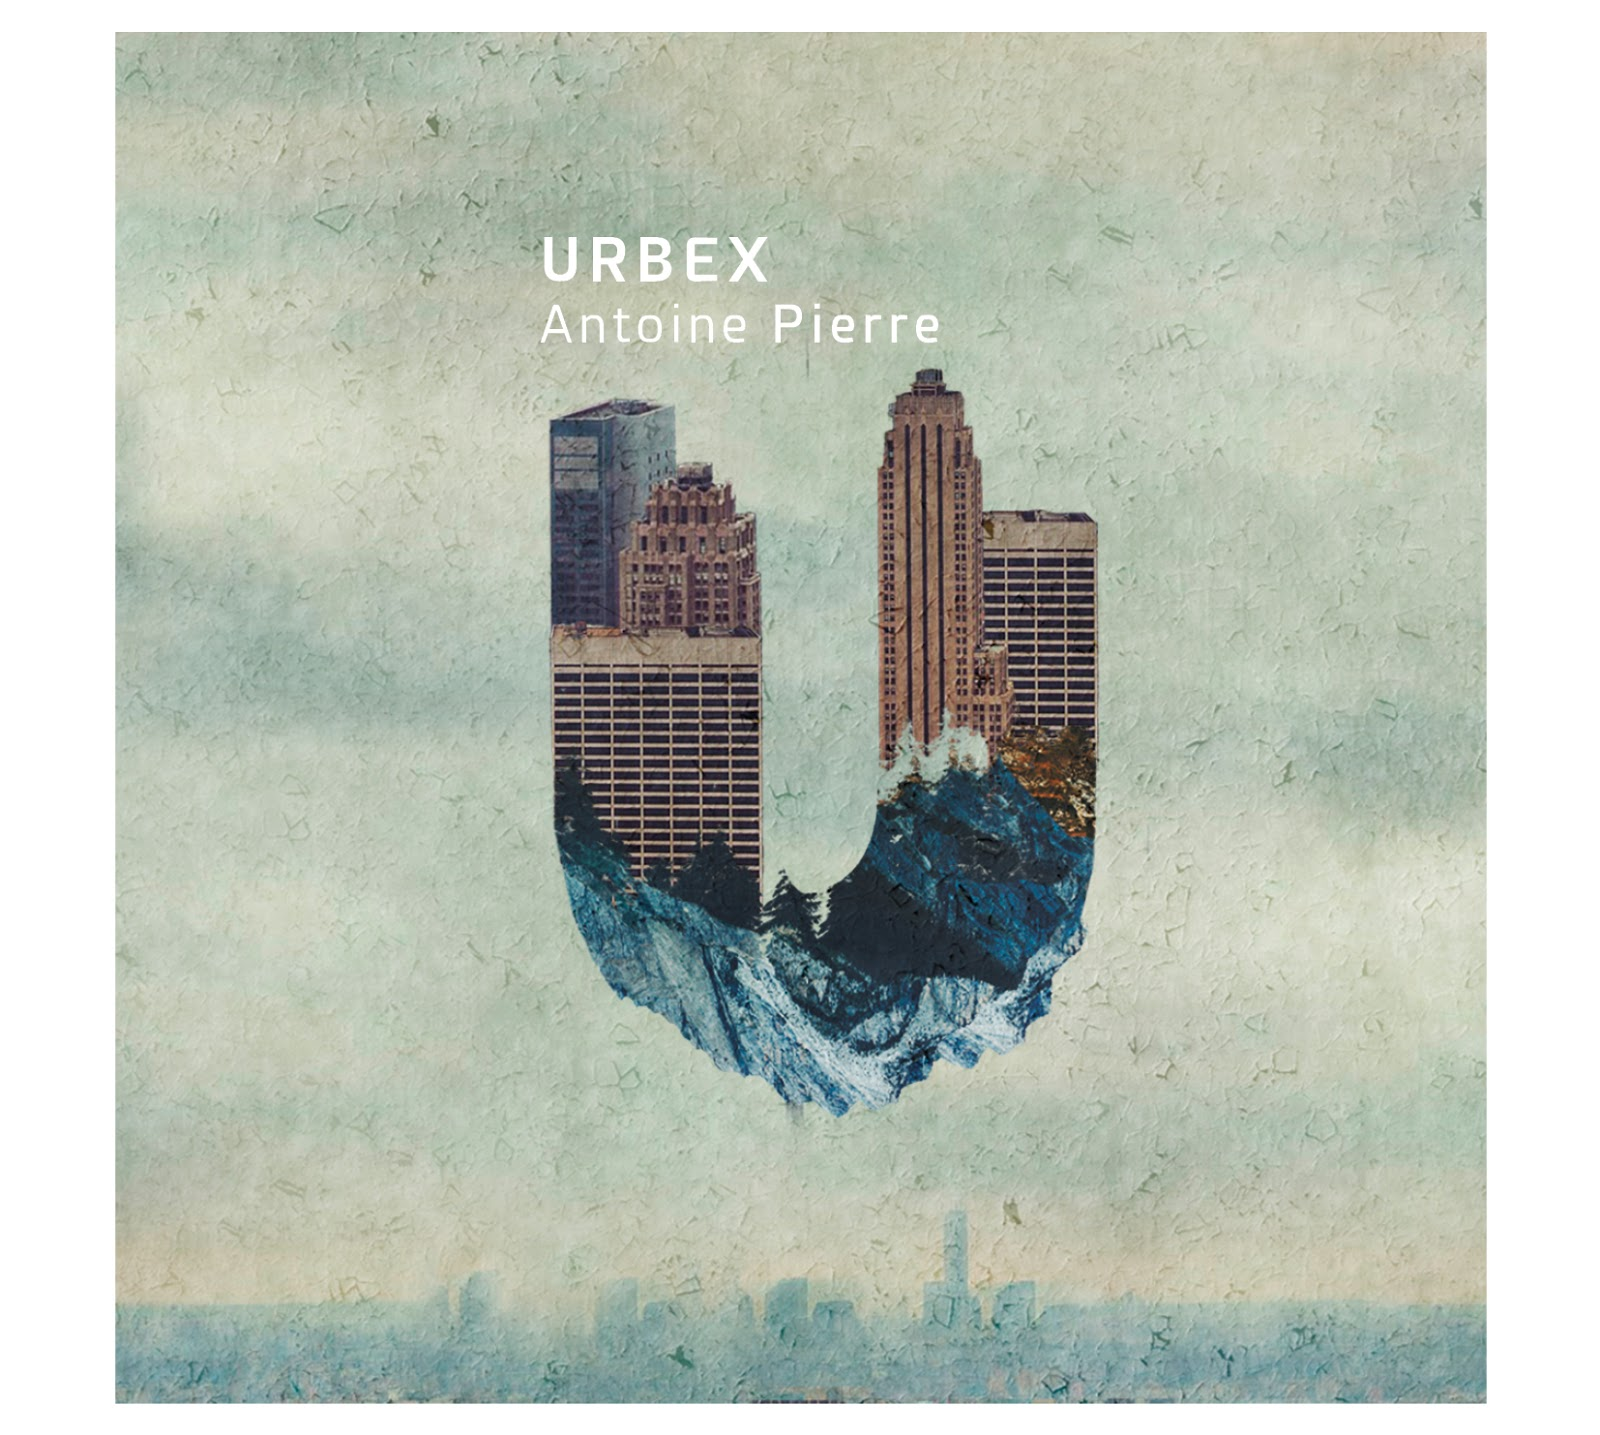 Republic Of Jazz Feb 8 2016 Power Relay Urbex Antoine Pierre